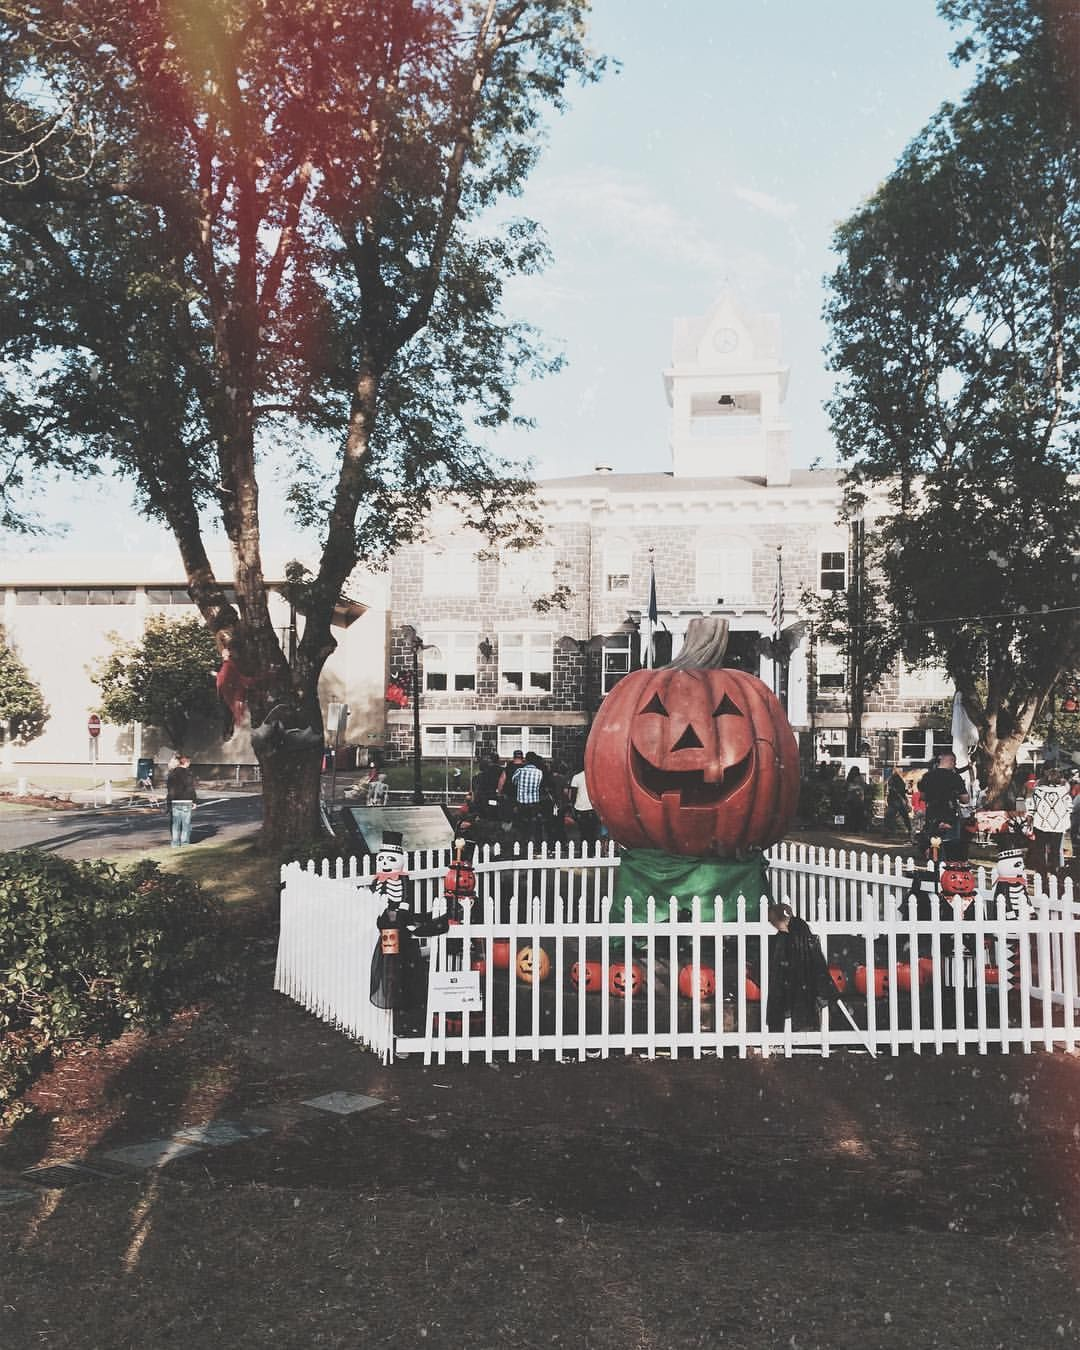 Pin by McKenna Buck on HALLOWEEN Halloween town, Vintage